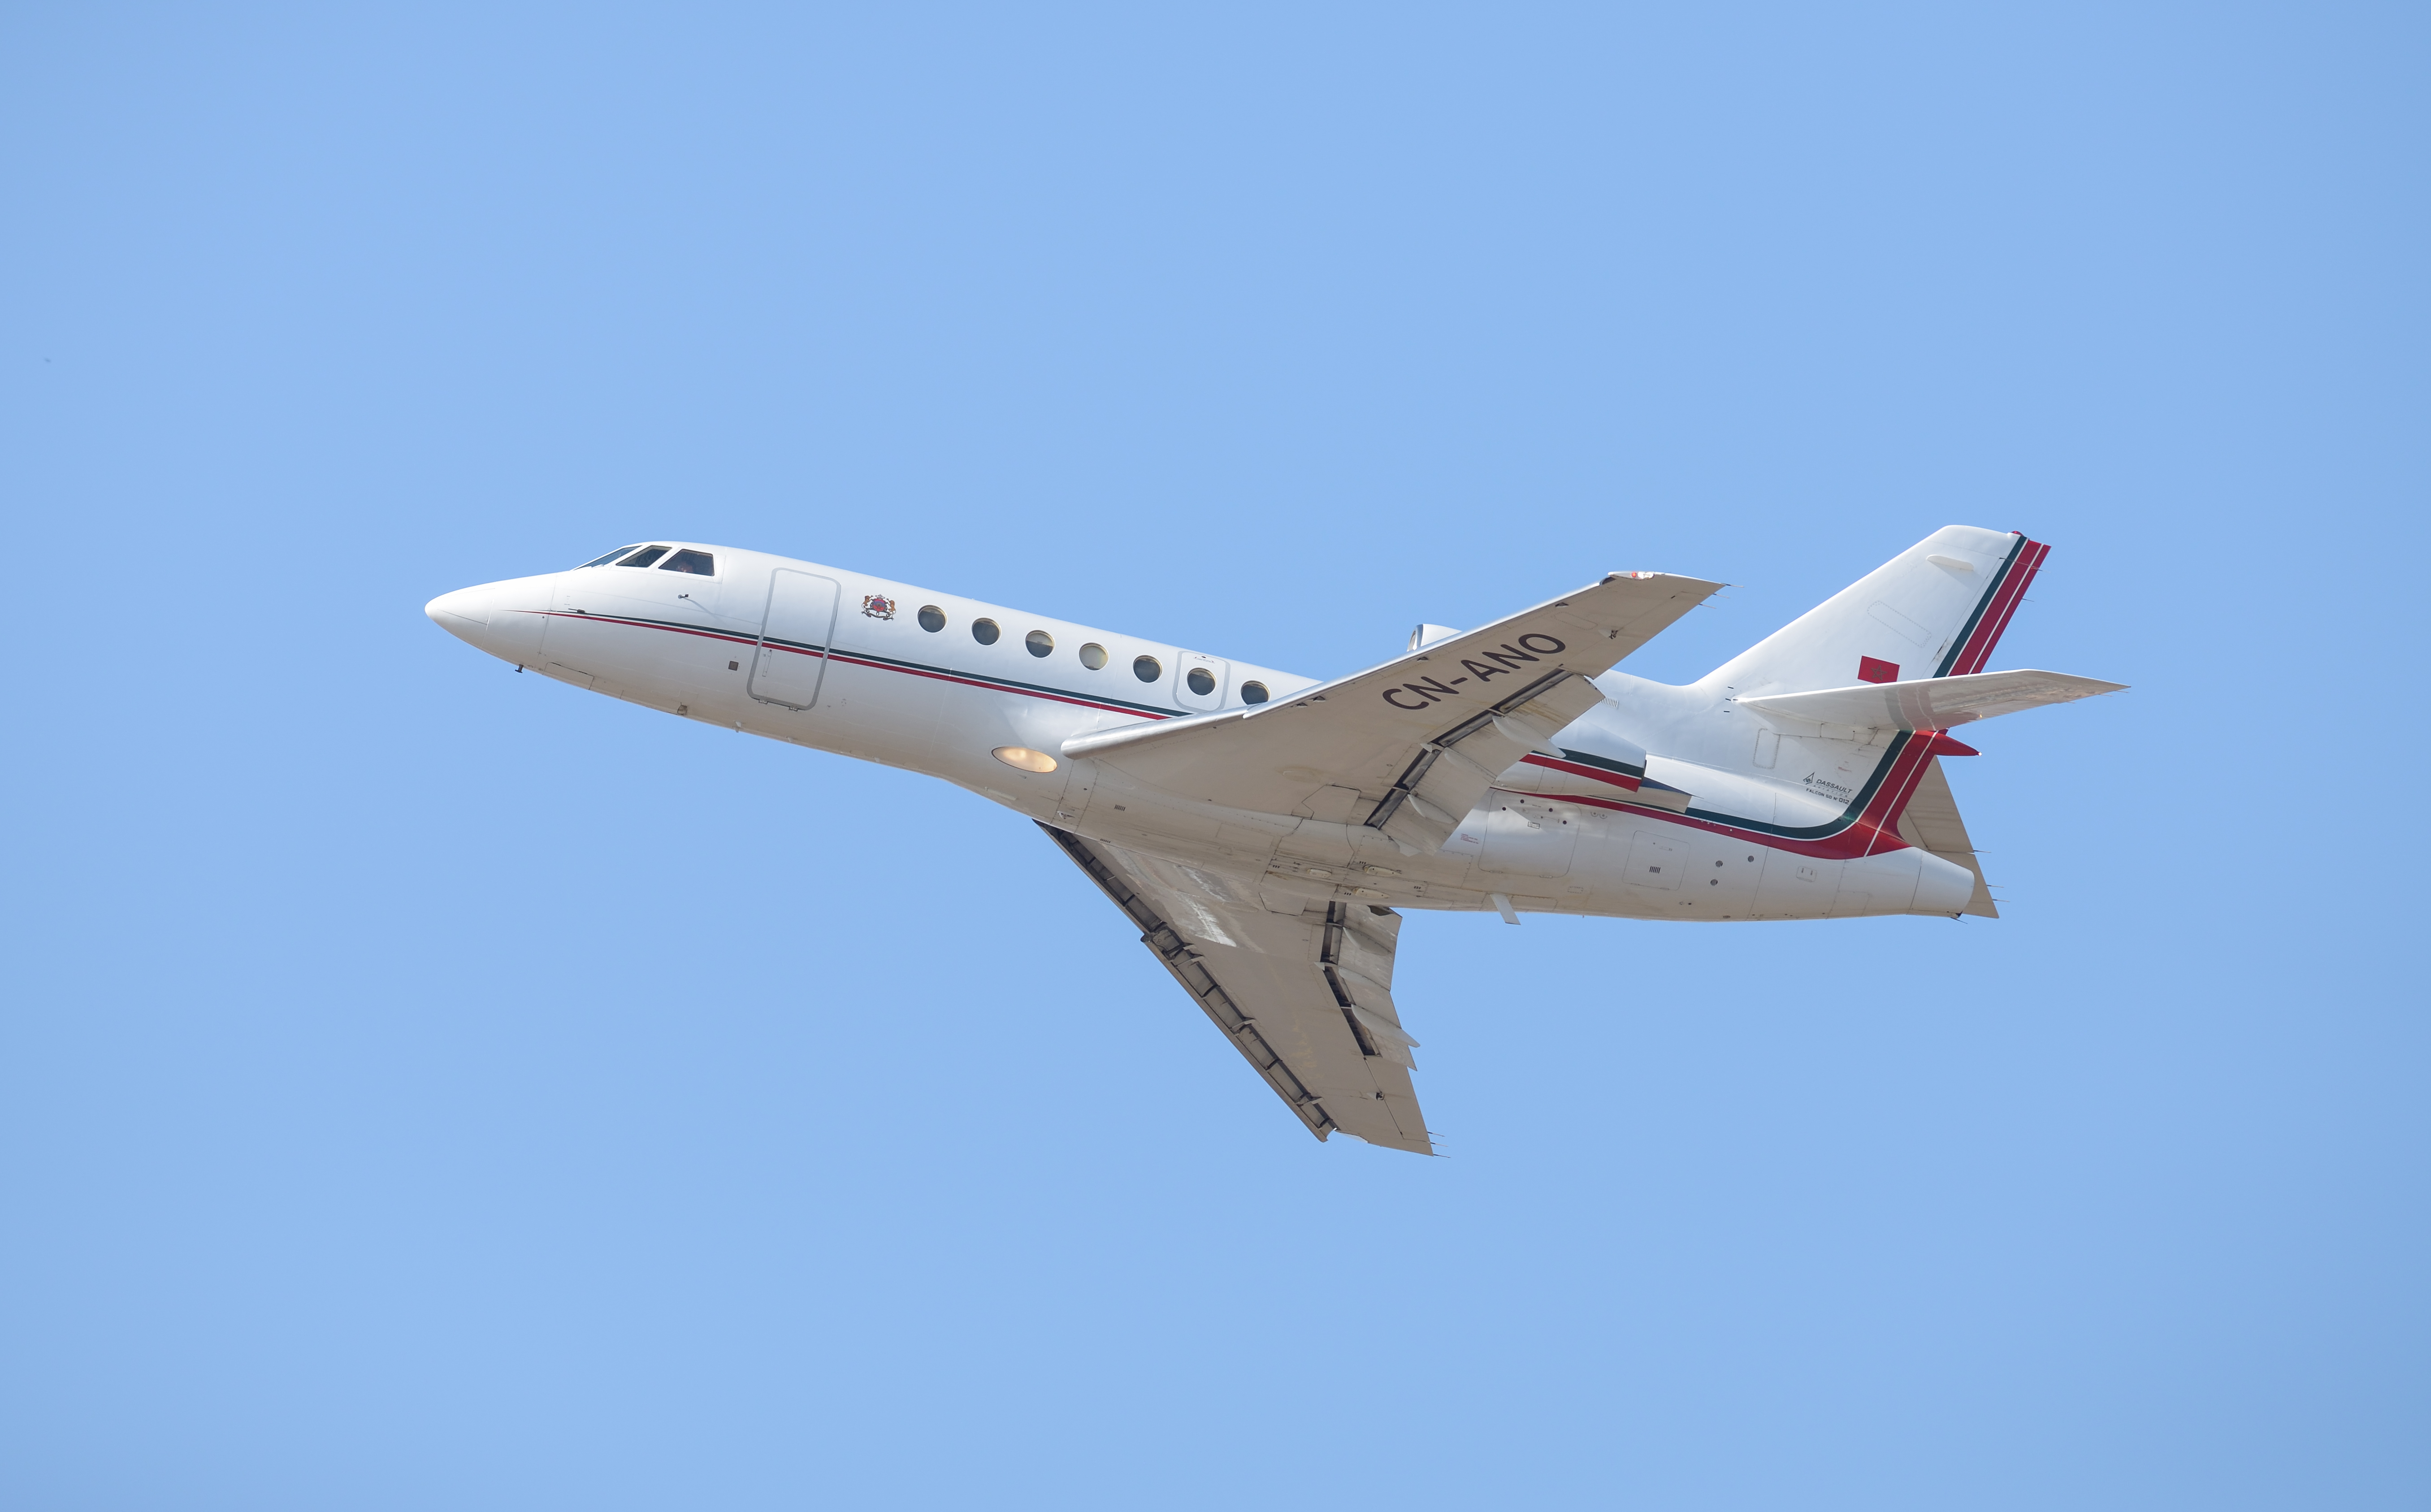 FRA: Avions VIP, Liaison & ECM - Page 13 26266038814_49f9160607_o